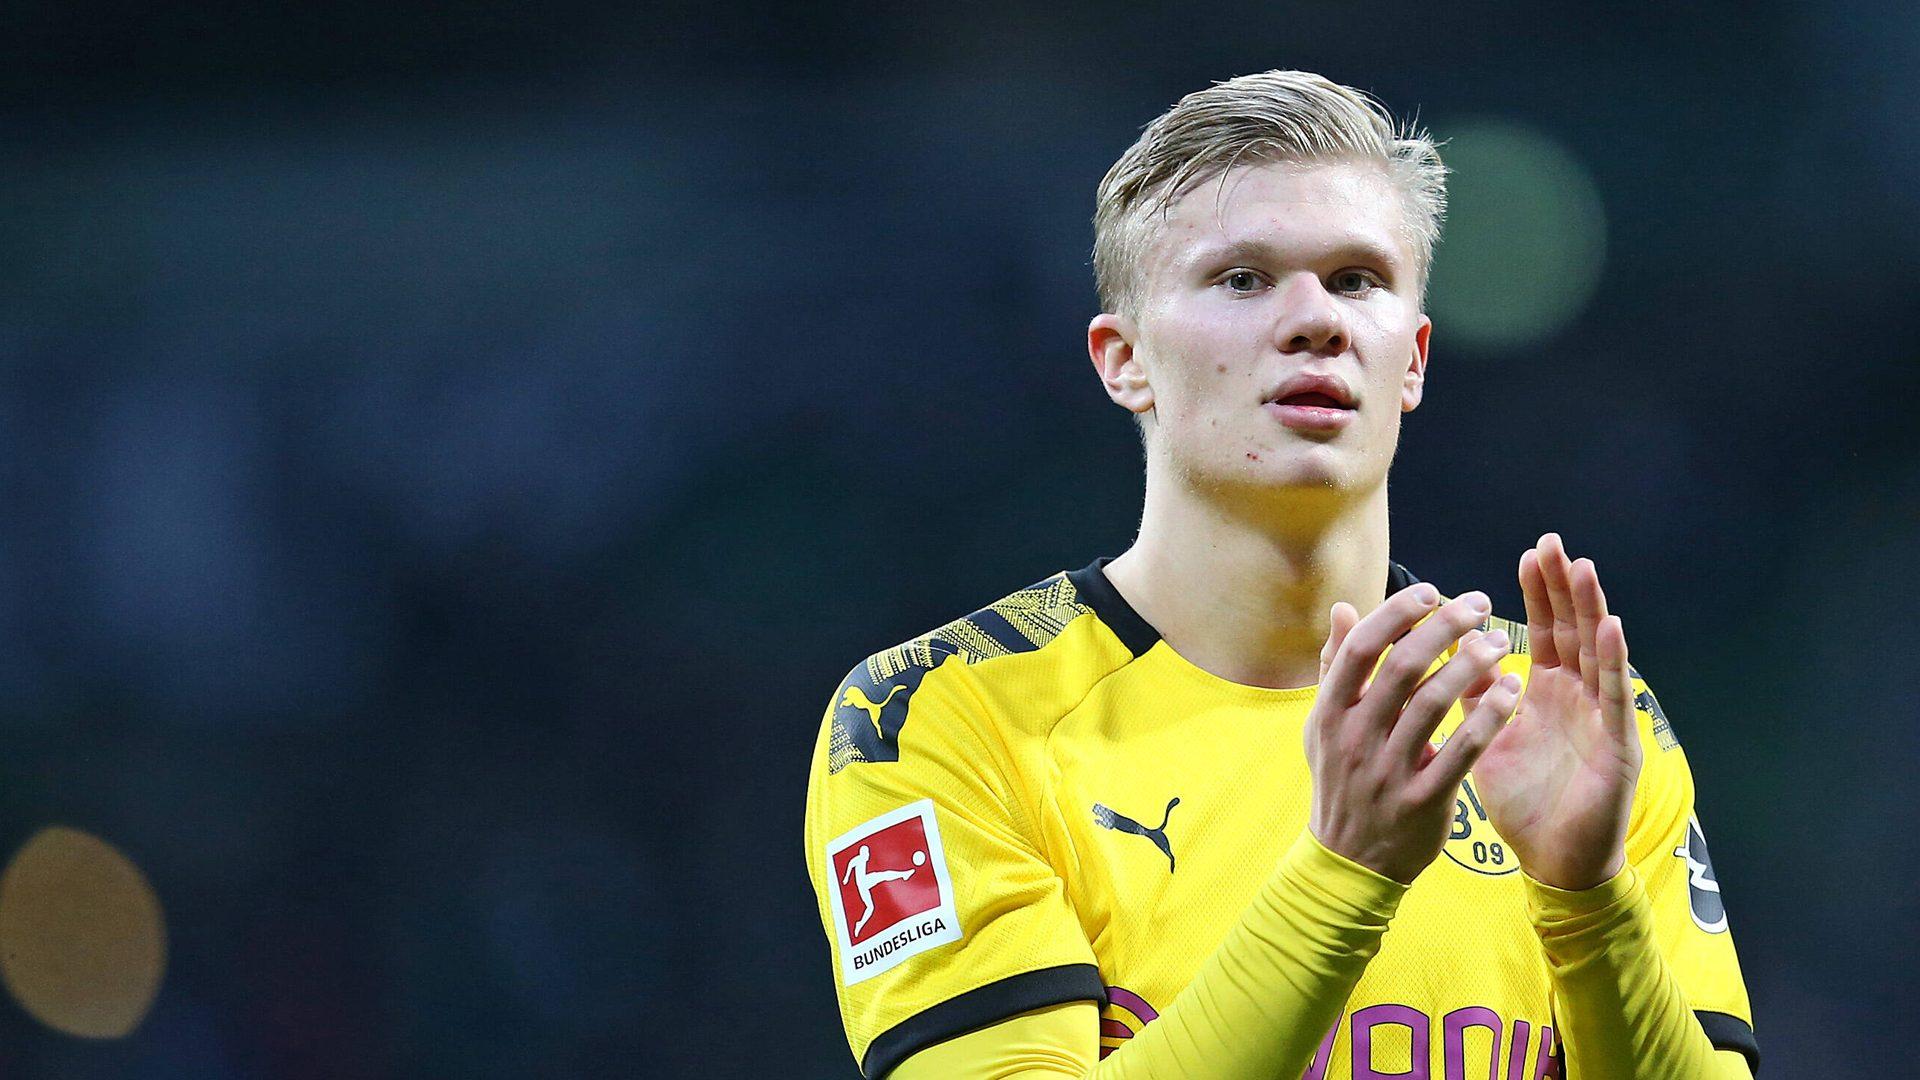 Bundesliga | Erling Haaland named Borussia Dortmund's new No.9